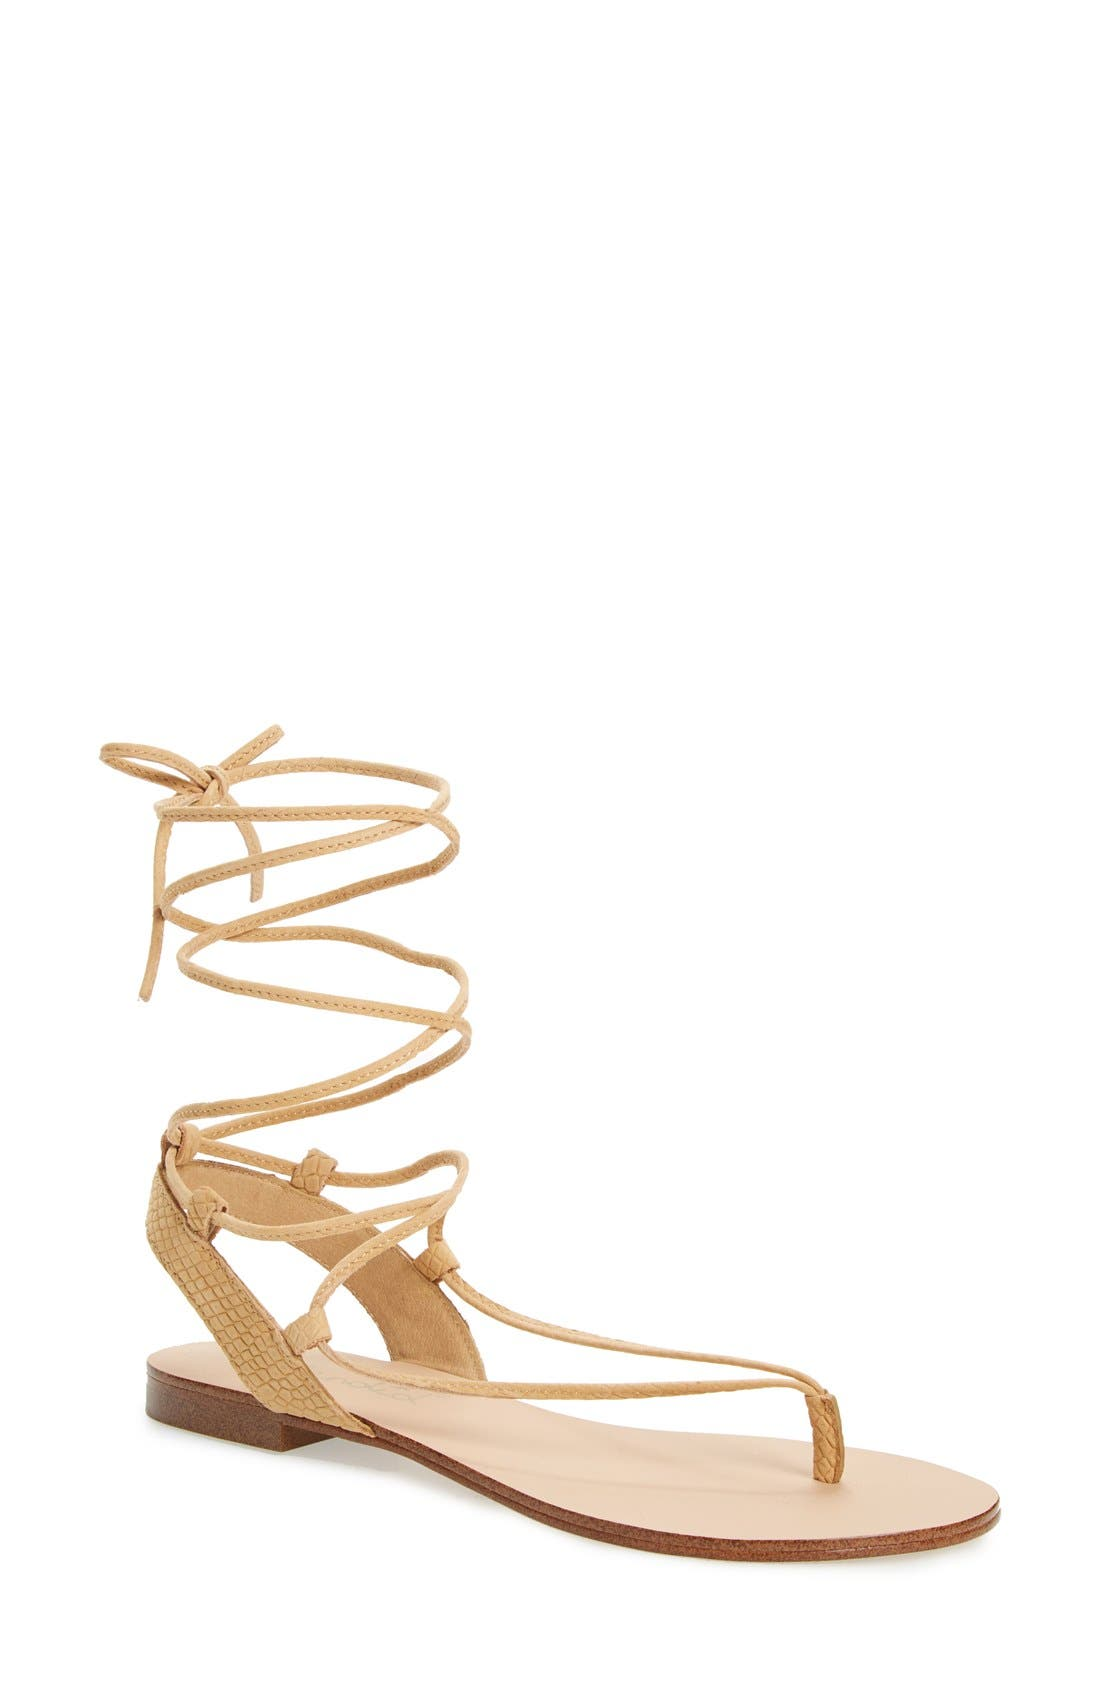 Alternate Image 1 Selected - Splendid 'Candee' Wraparound Lace Flat Sandal (Women)